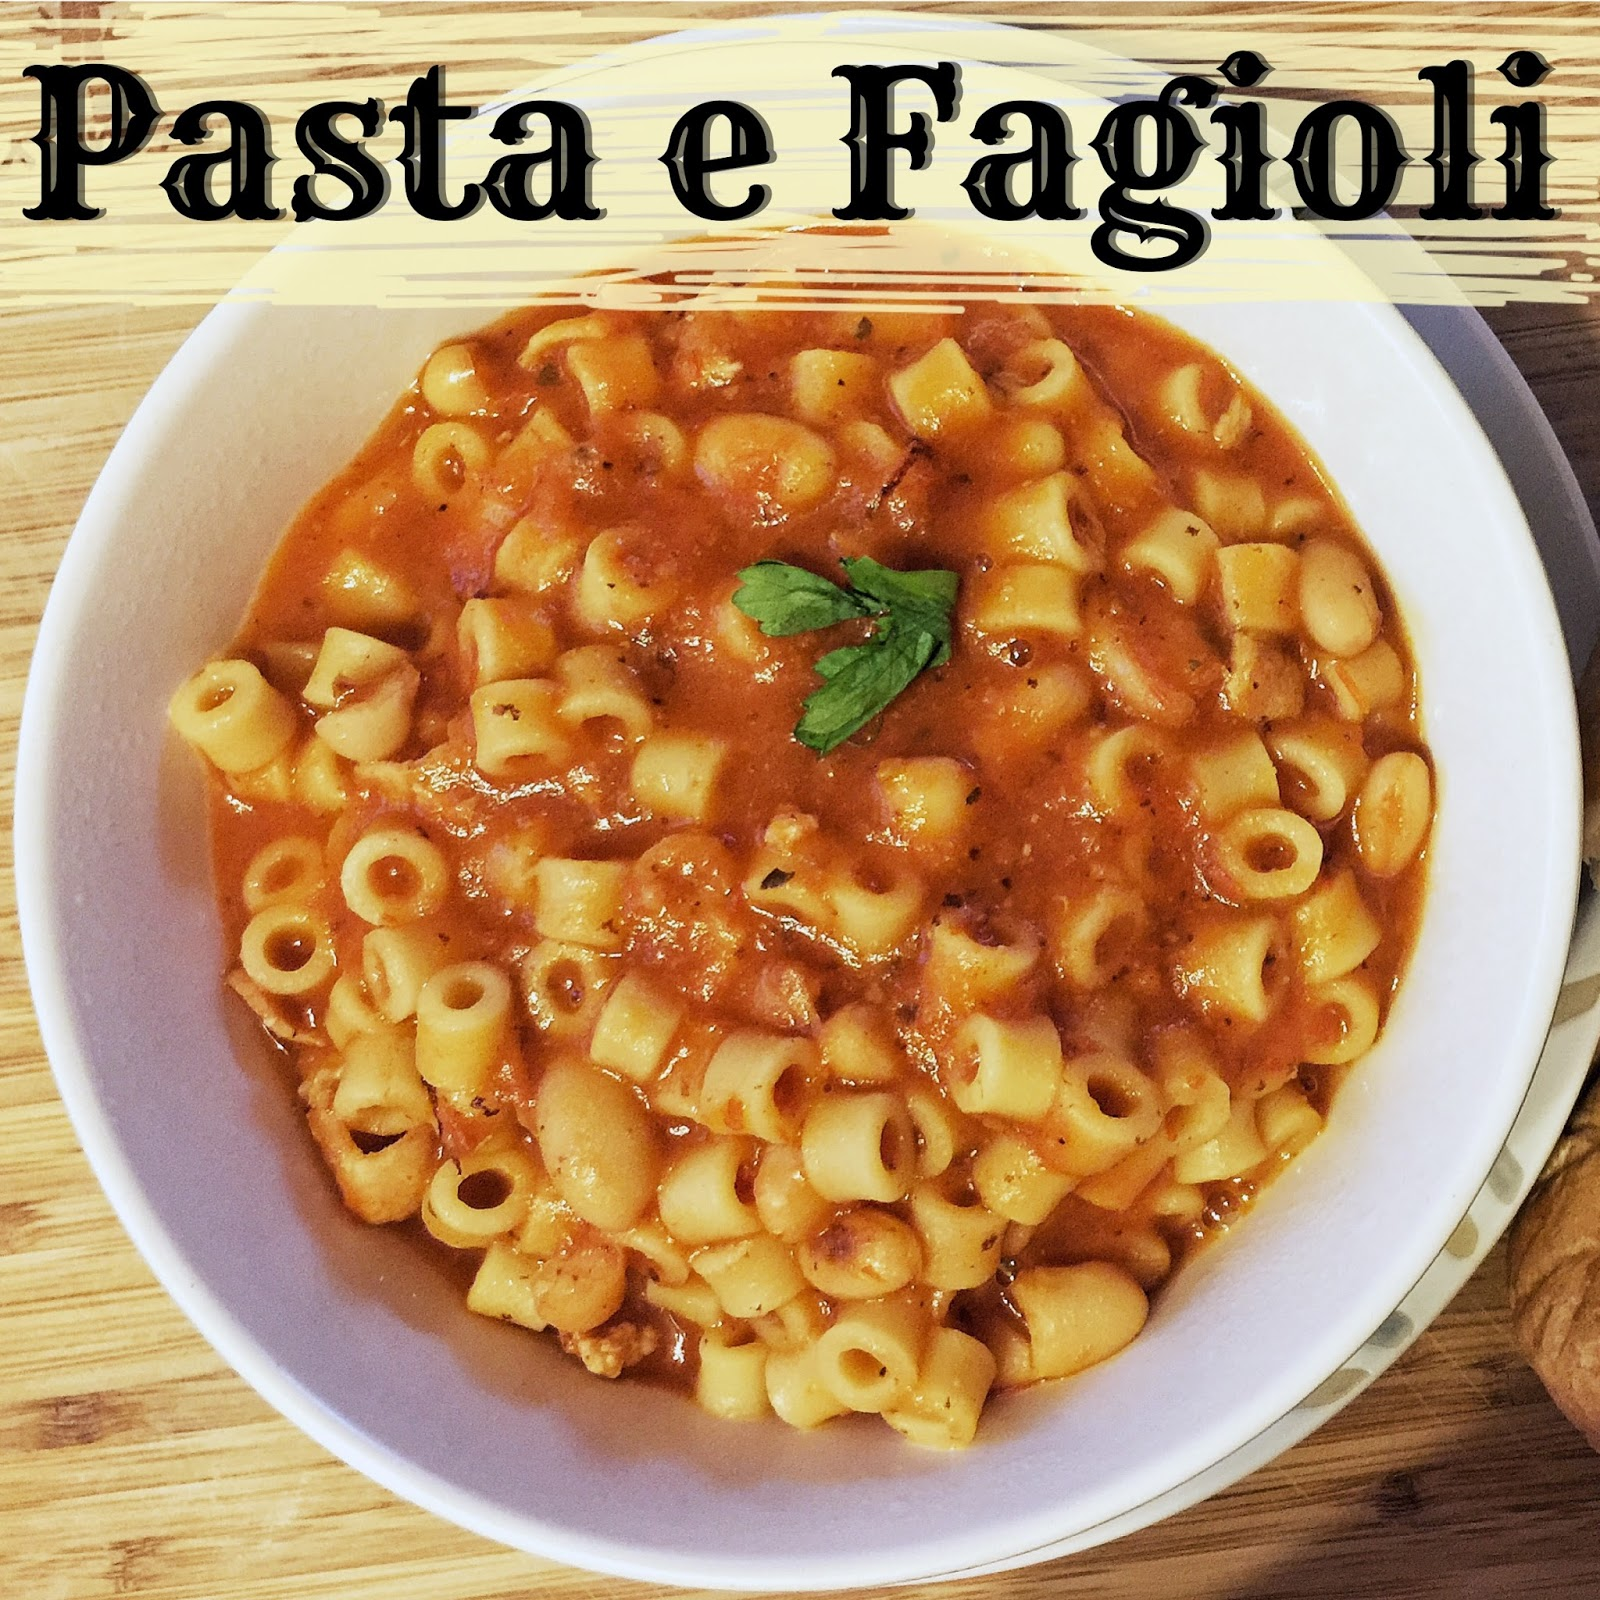 pasta e fagioli recipes 30 minute pasta and kidney bean soup pasta e ...